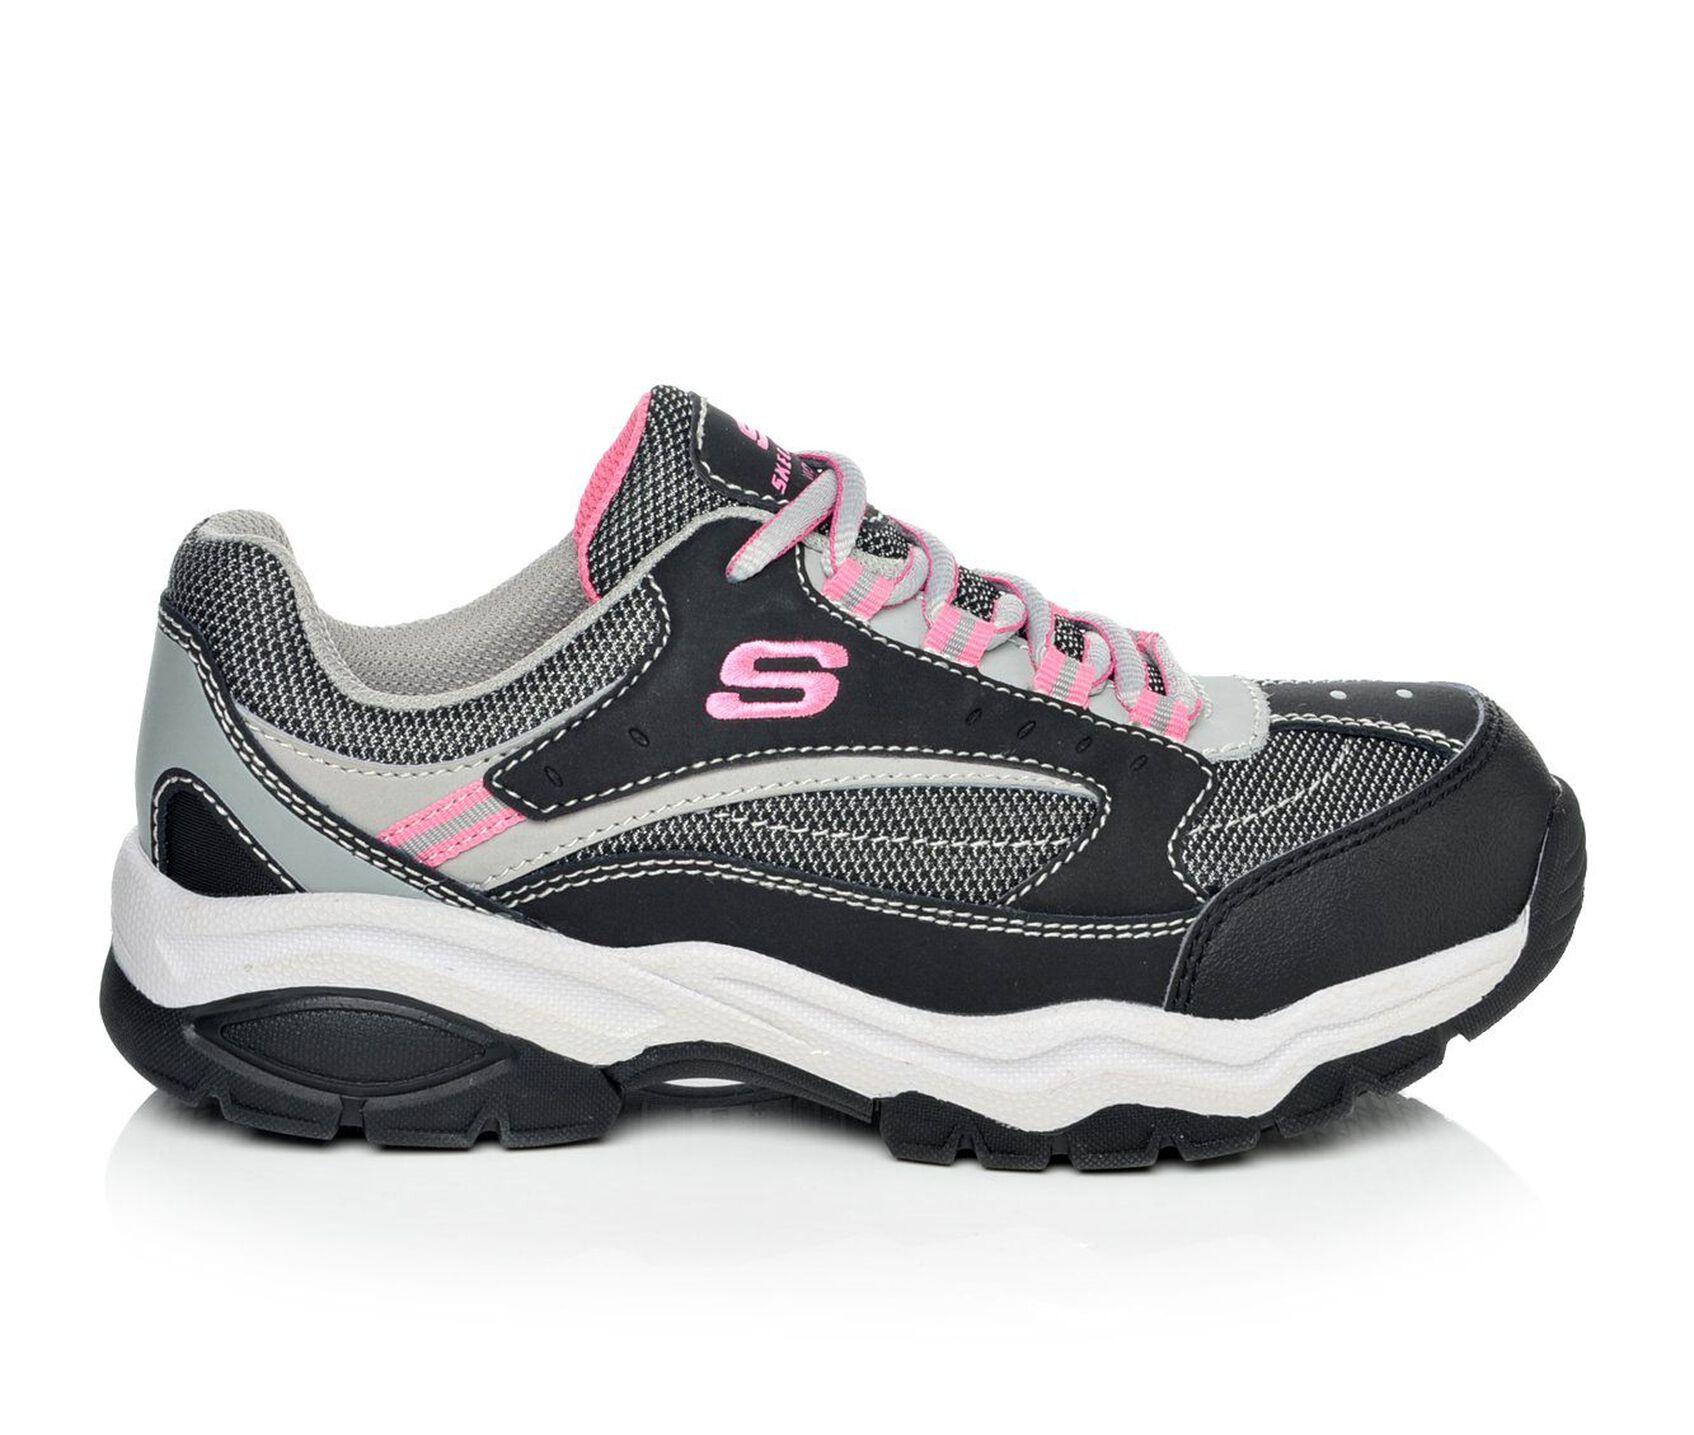 9ab9d38bbf0b Women s Skechers Work 76601 Biscoe Steel Toe Work Shoes